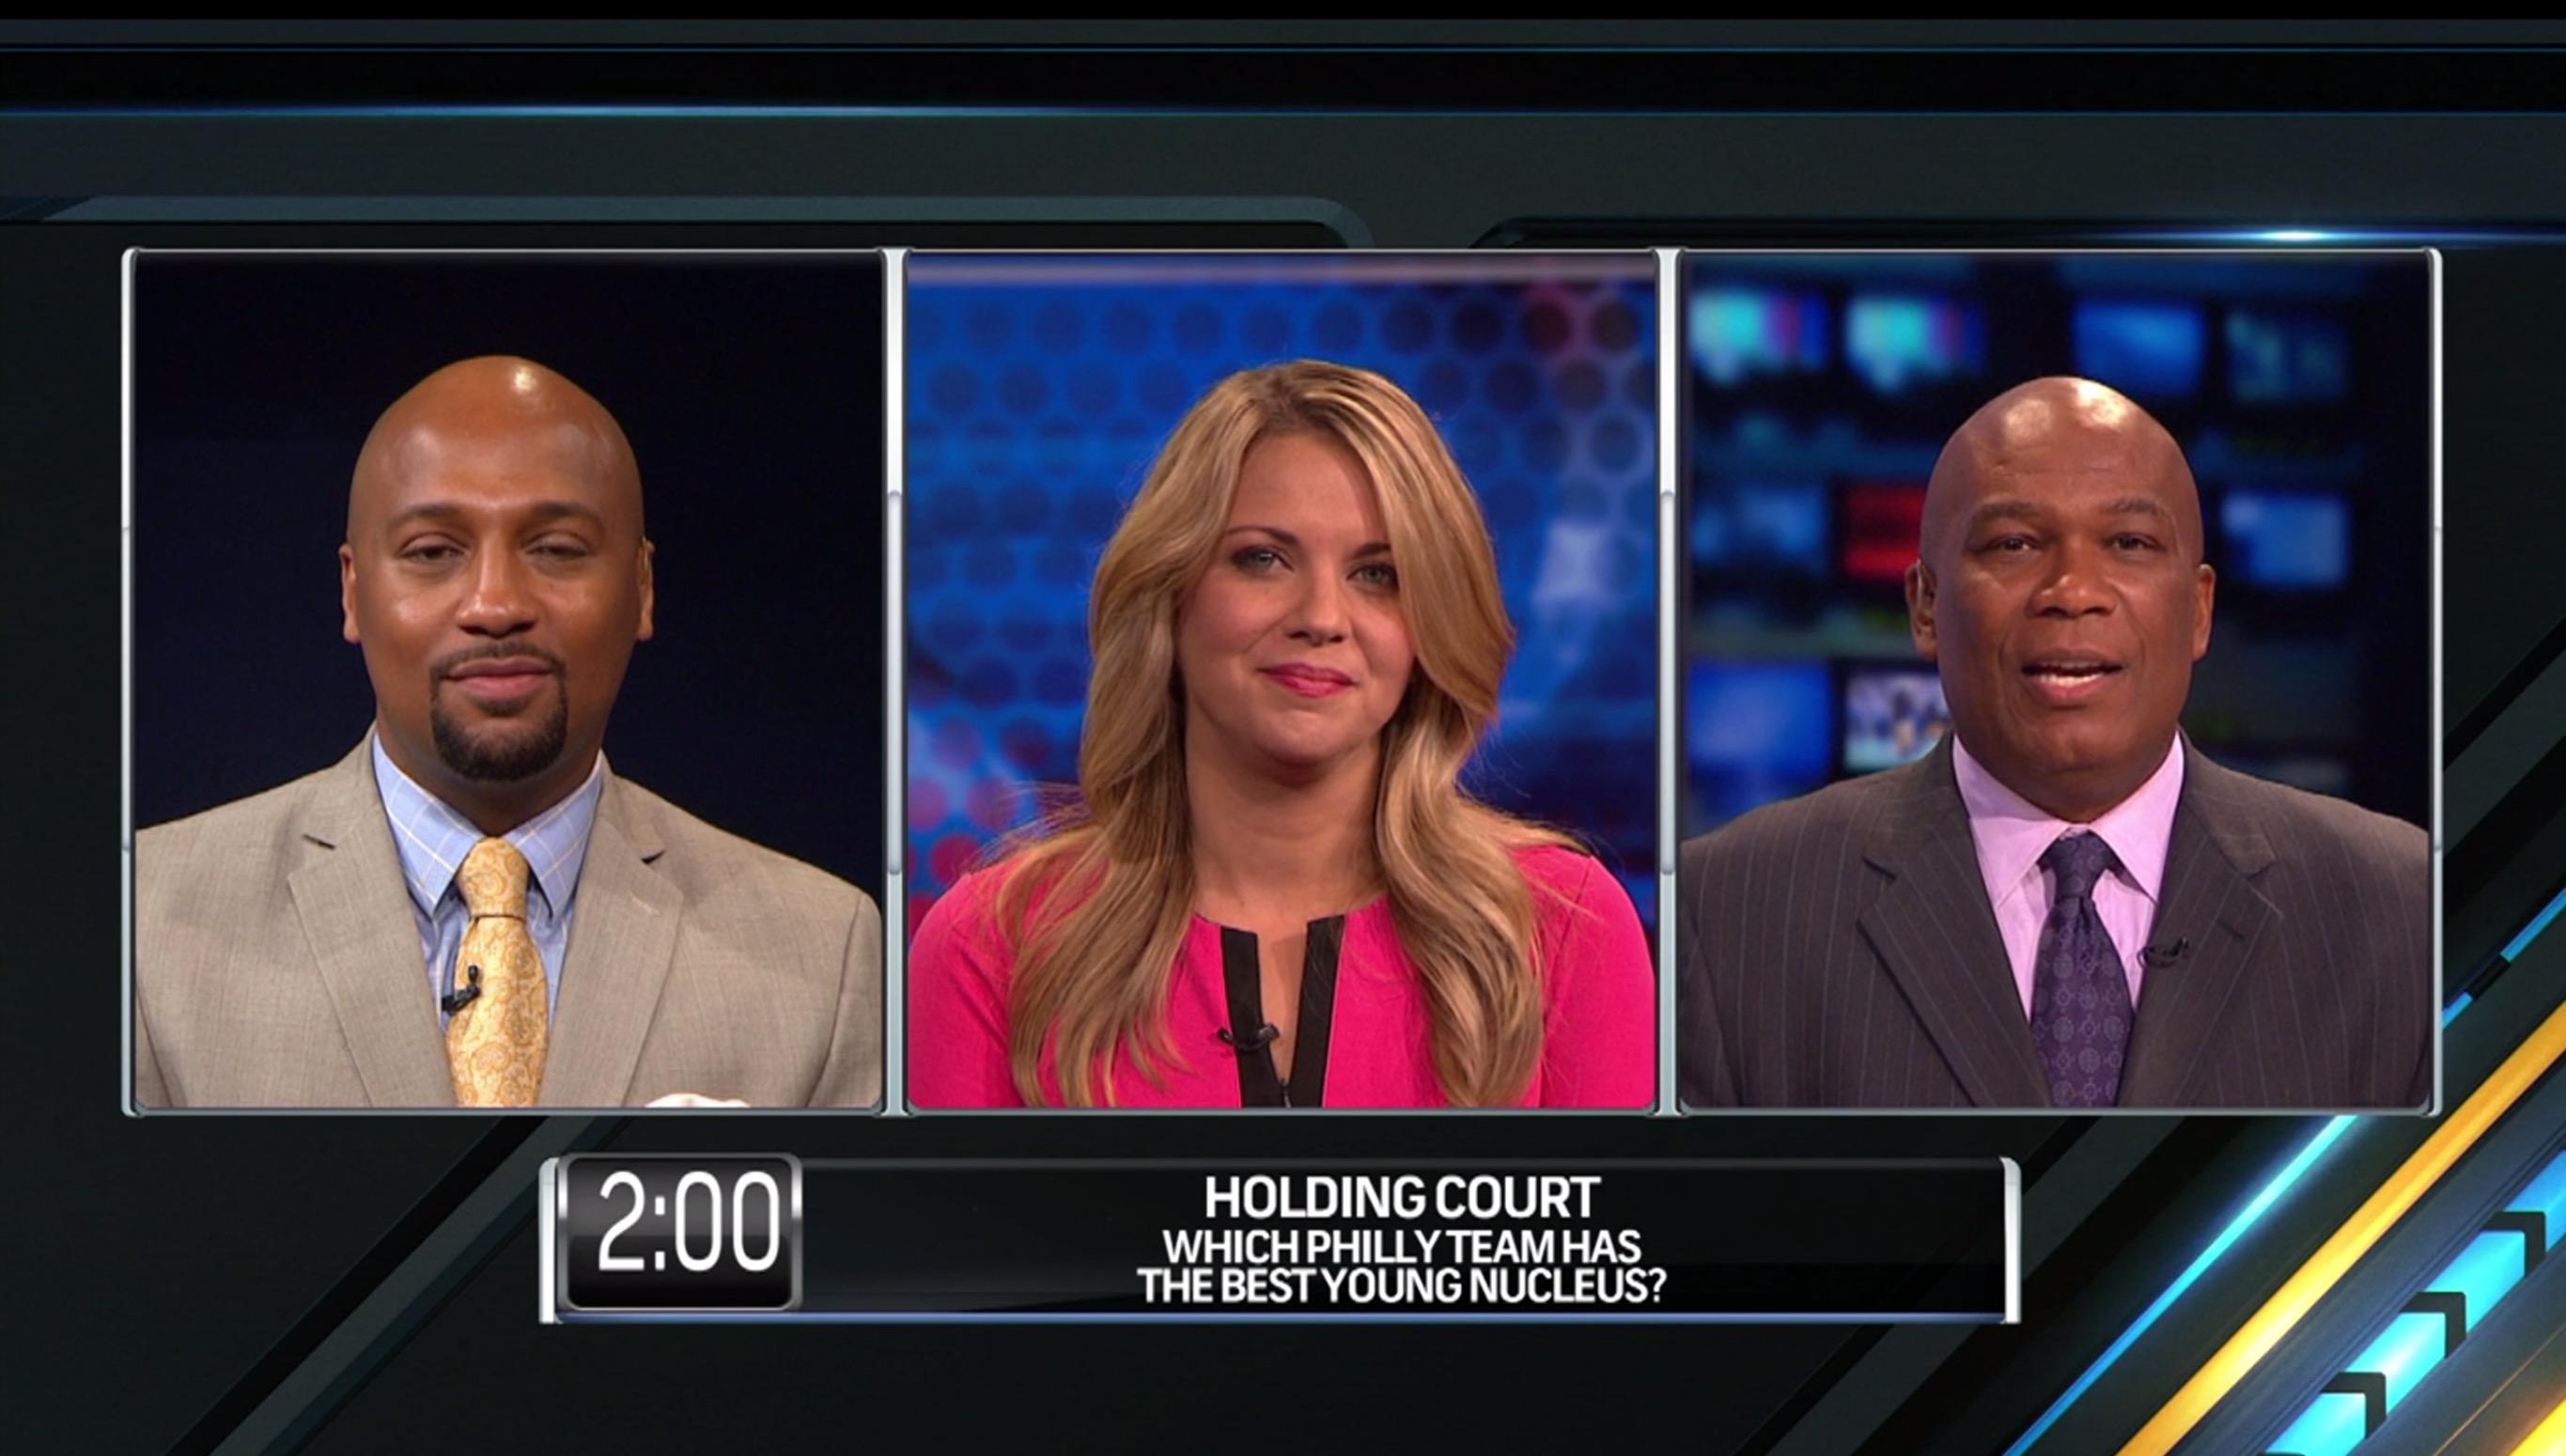 Comcast Sportsnet Philadelphia Now Embracing Debate To Attract Millennials